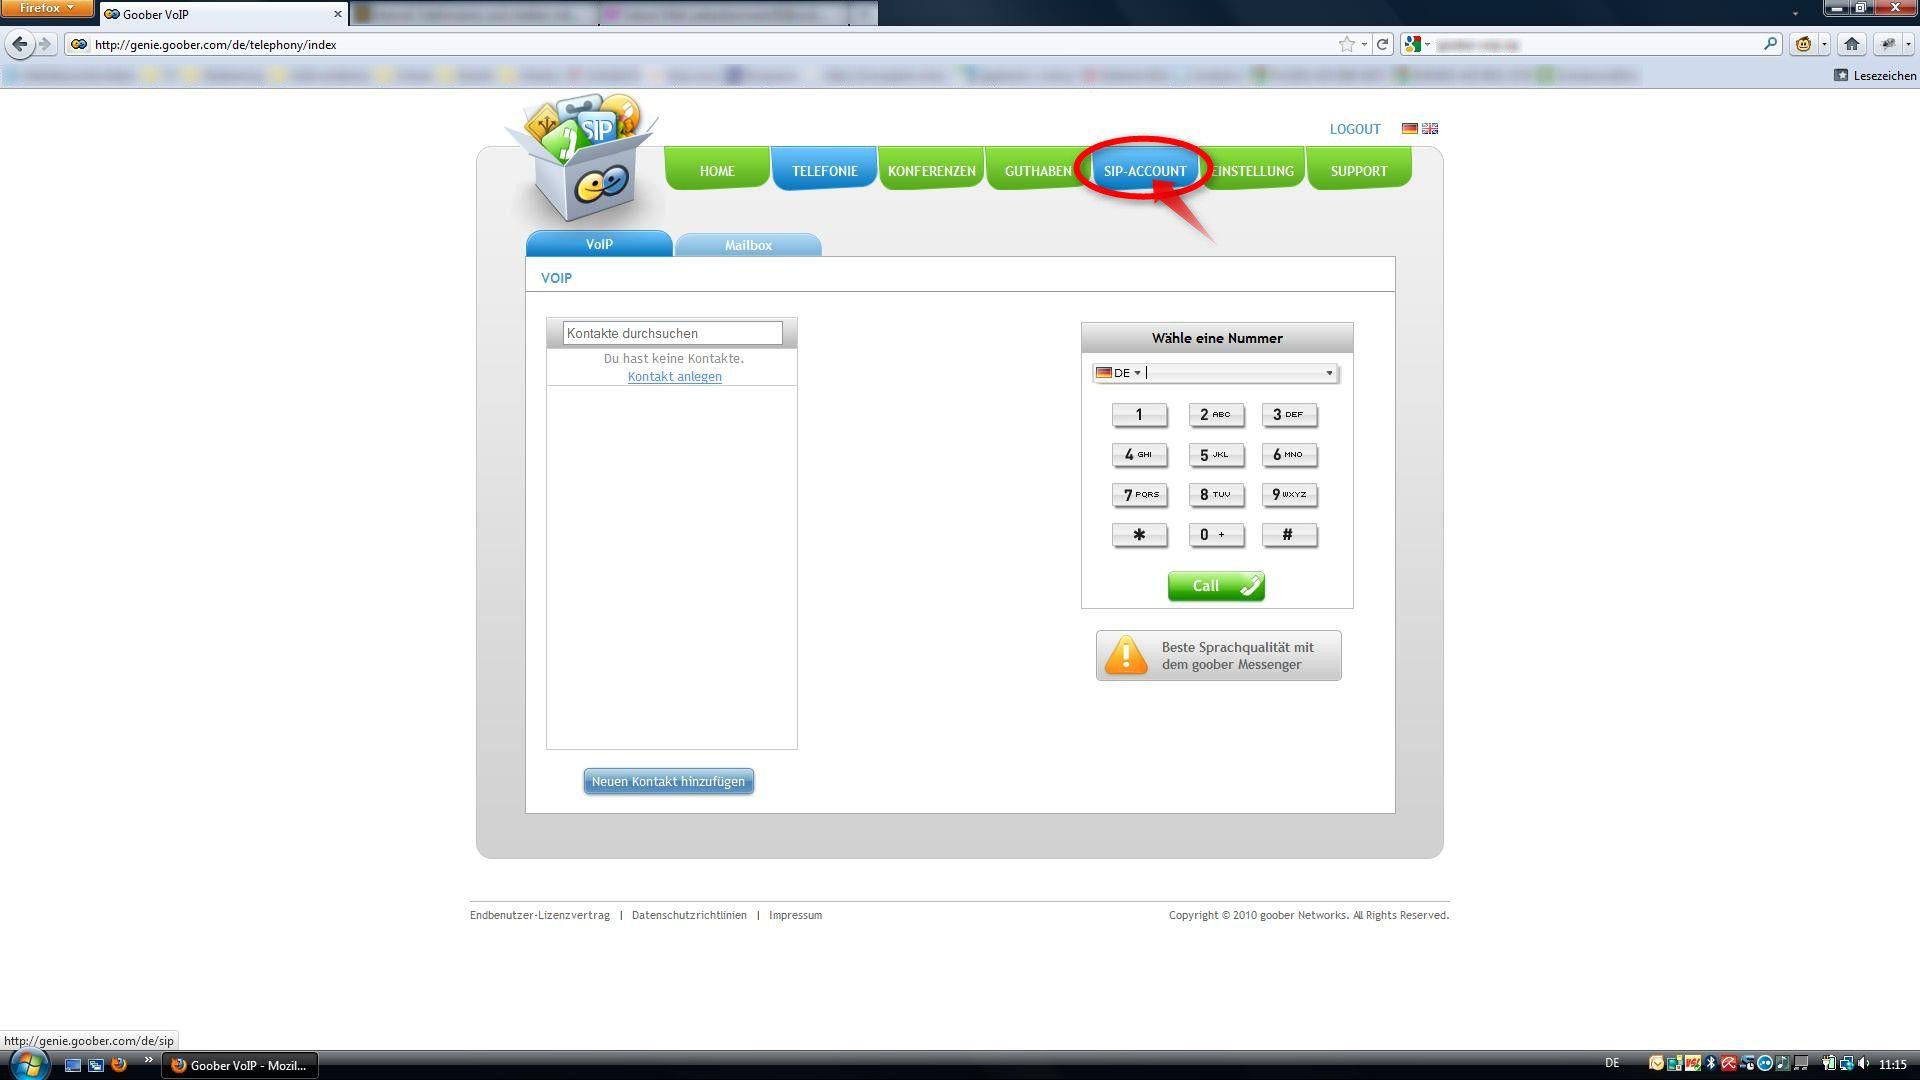 09-ipod-touch-in-iphone-verwandeln-goober-voip-accountuebersicht-470.jpg?nocache=1303496209919